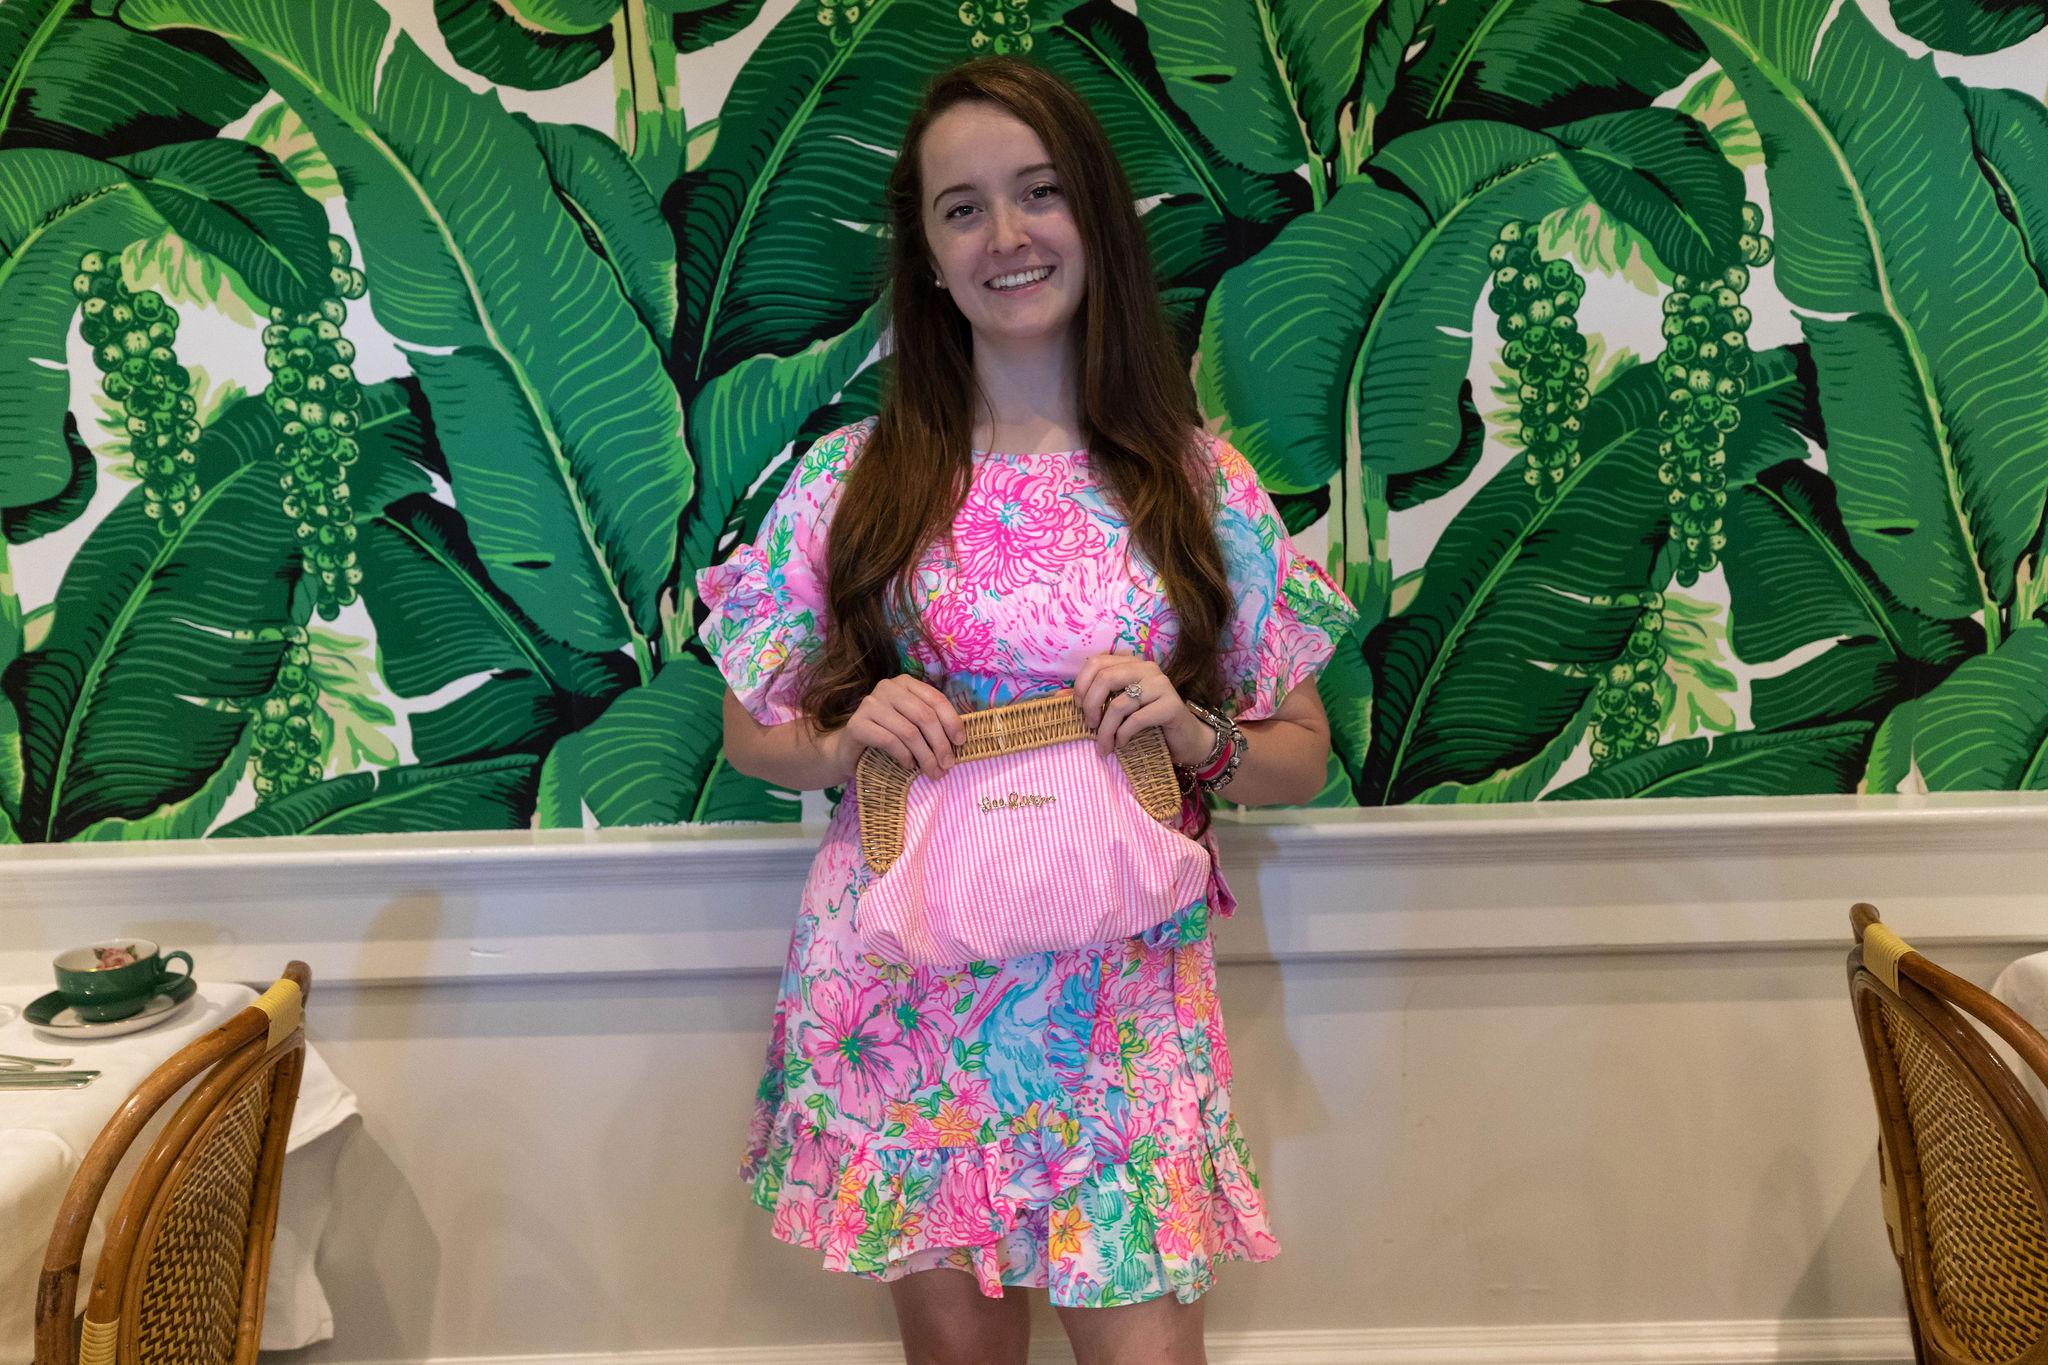 Neon Pink Tieks and Lilly Pulitzer Dress at Grand Hotel Mackinac Island Michigan Styled by Annie Fairfax